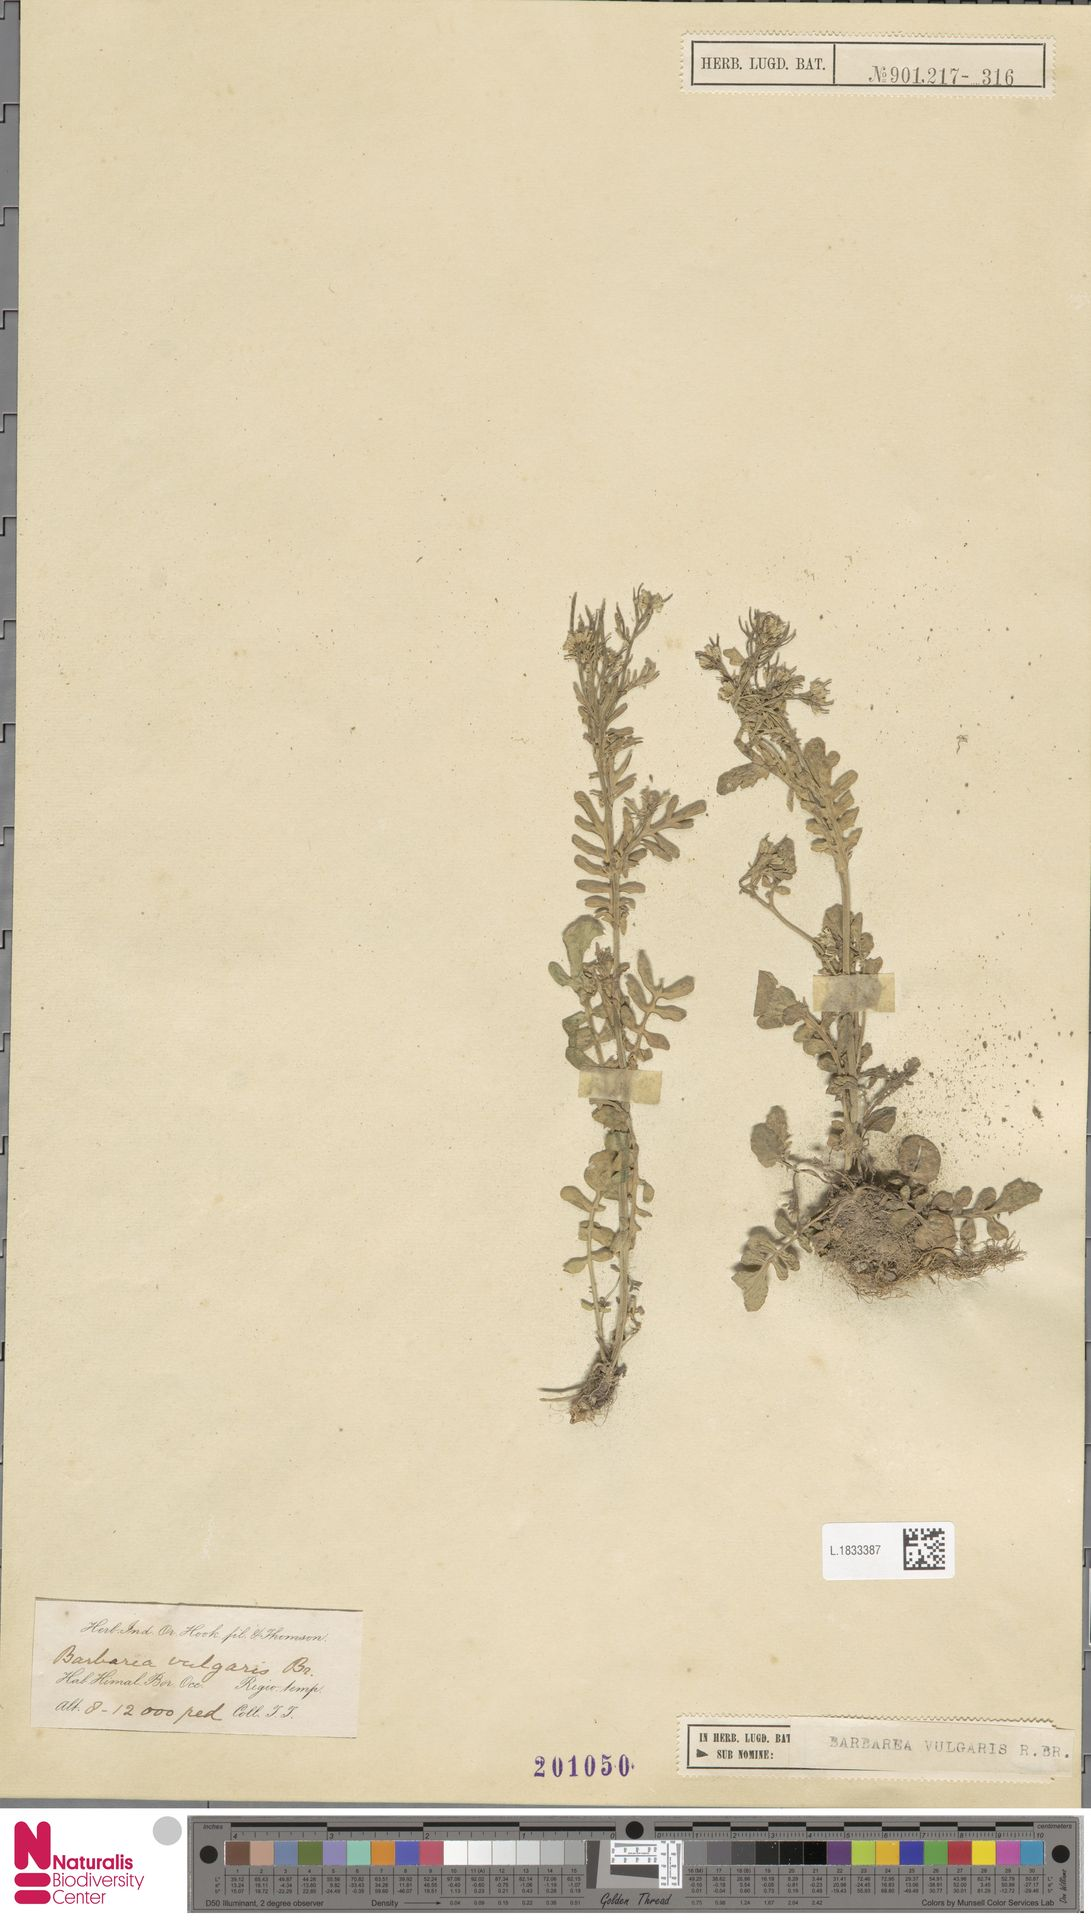 L.1833387   Barbarea vulgaris R.Br.